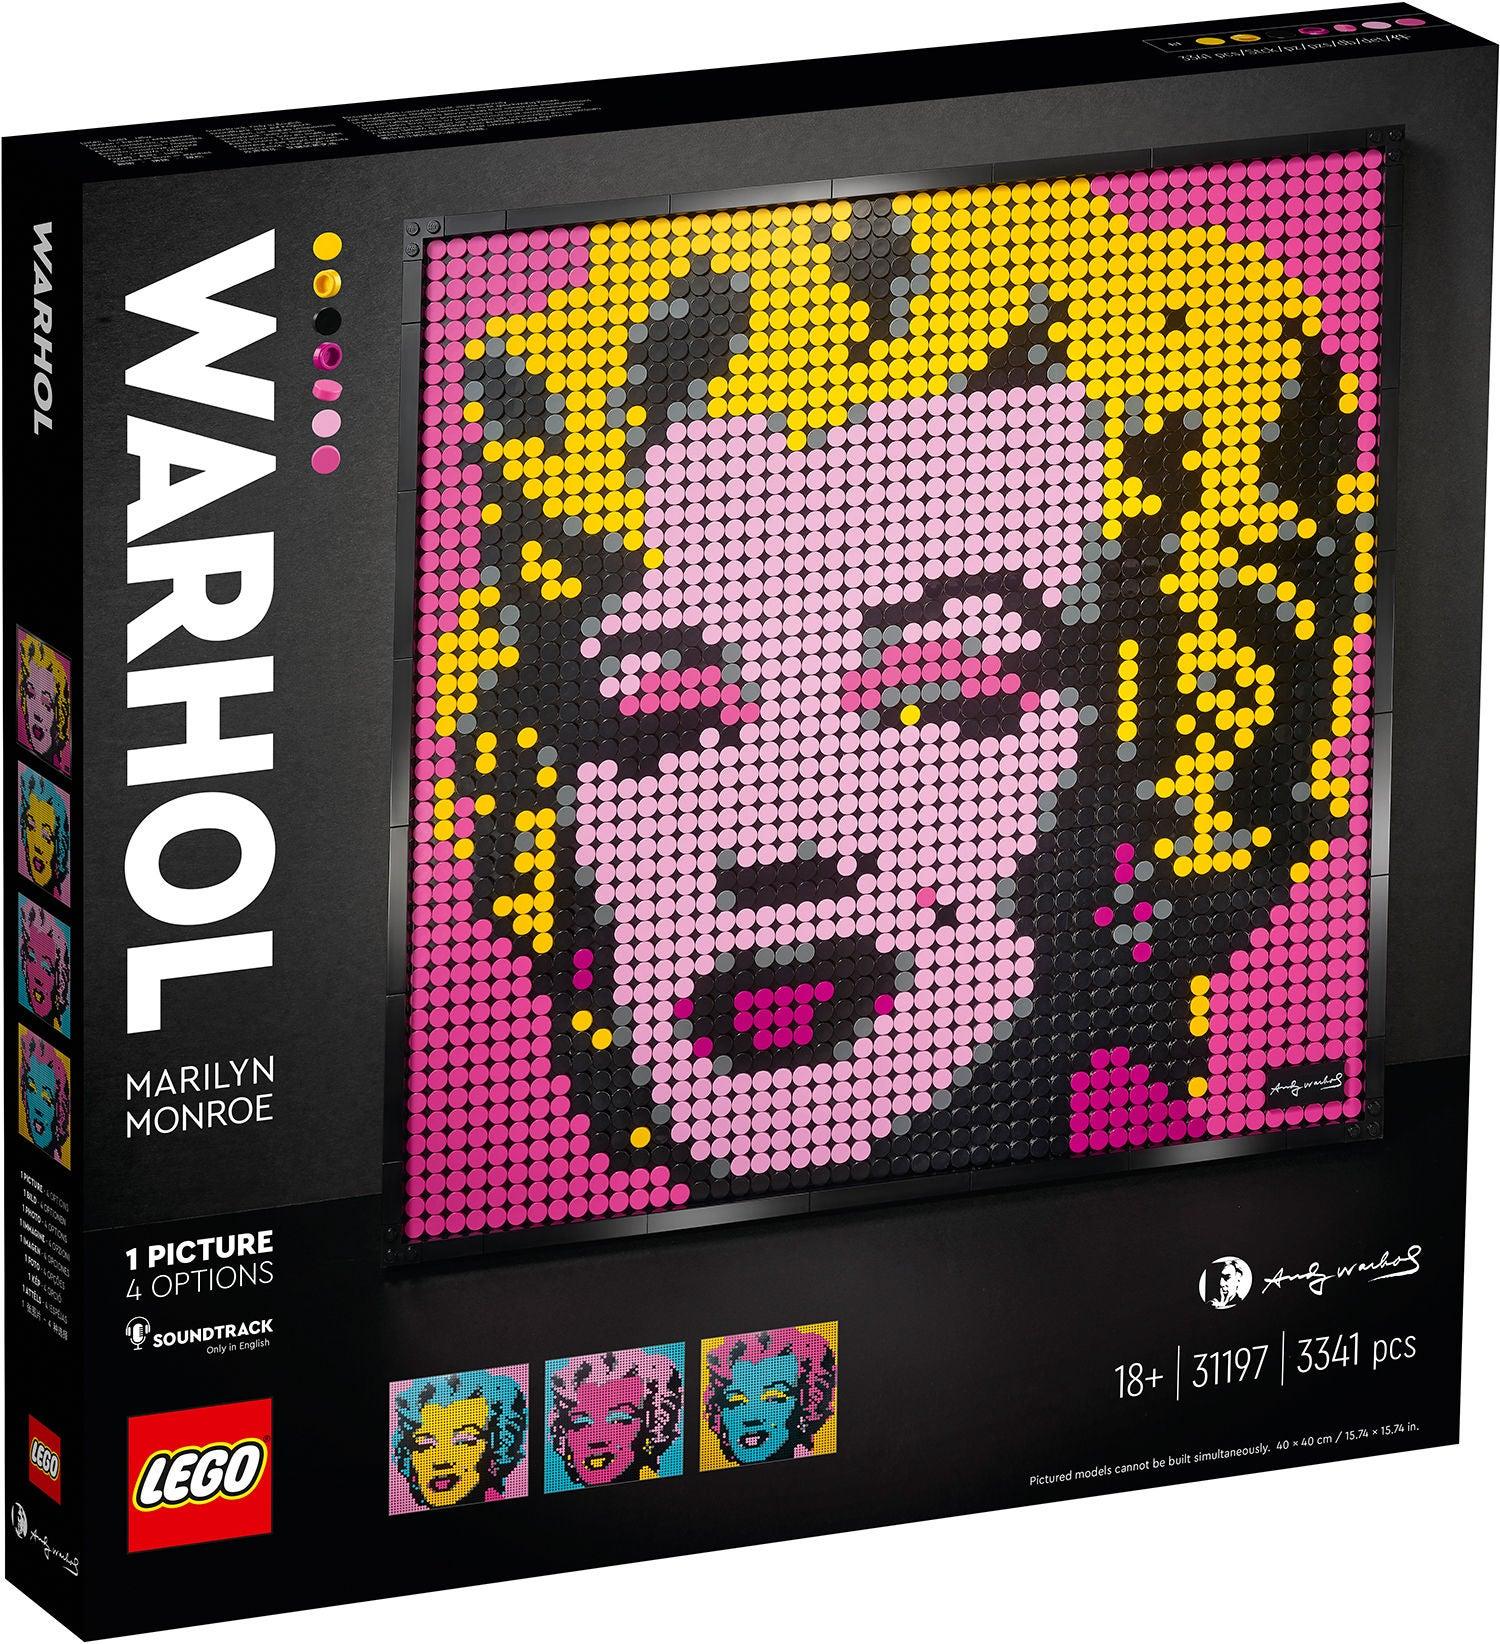 LEGO ART 31197 Andy Warhols Marilyn Monroe